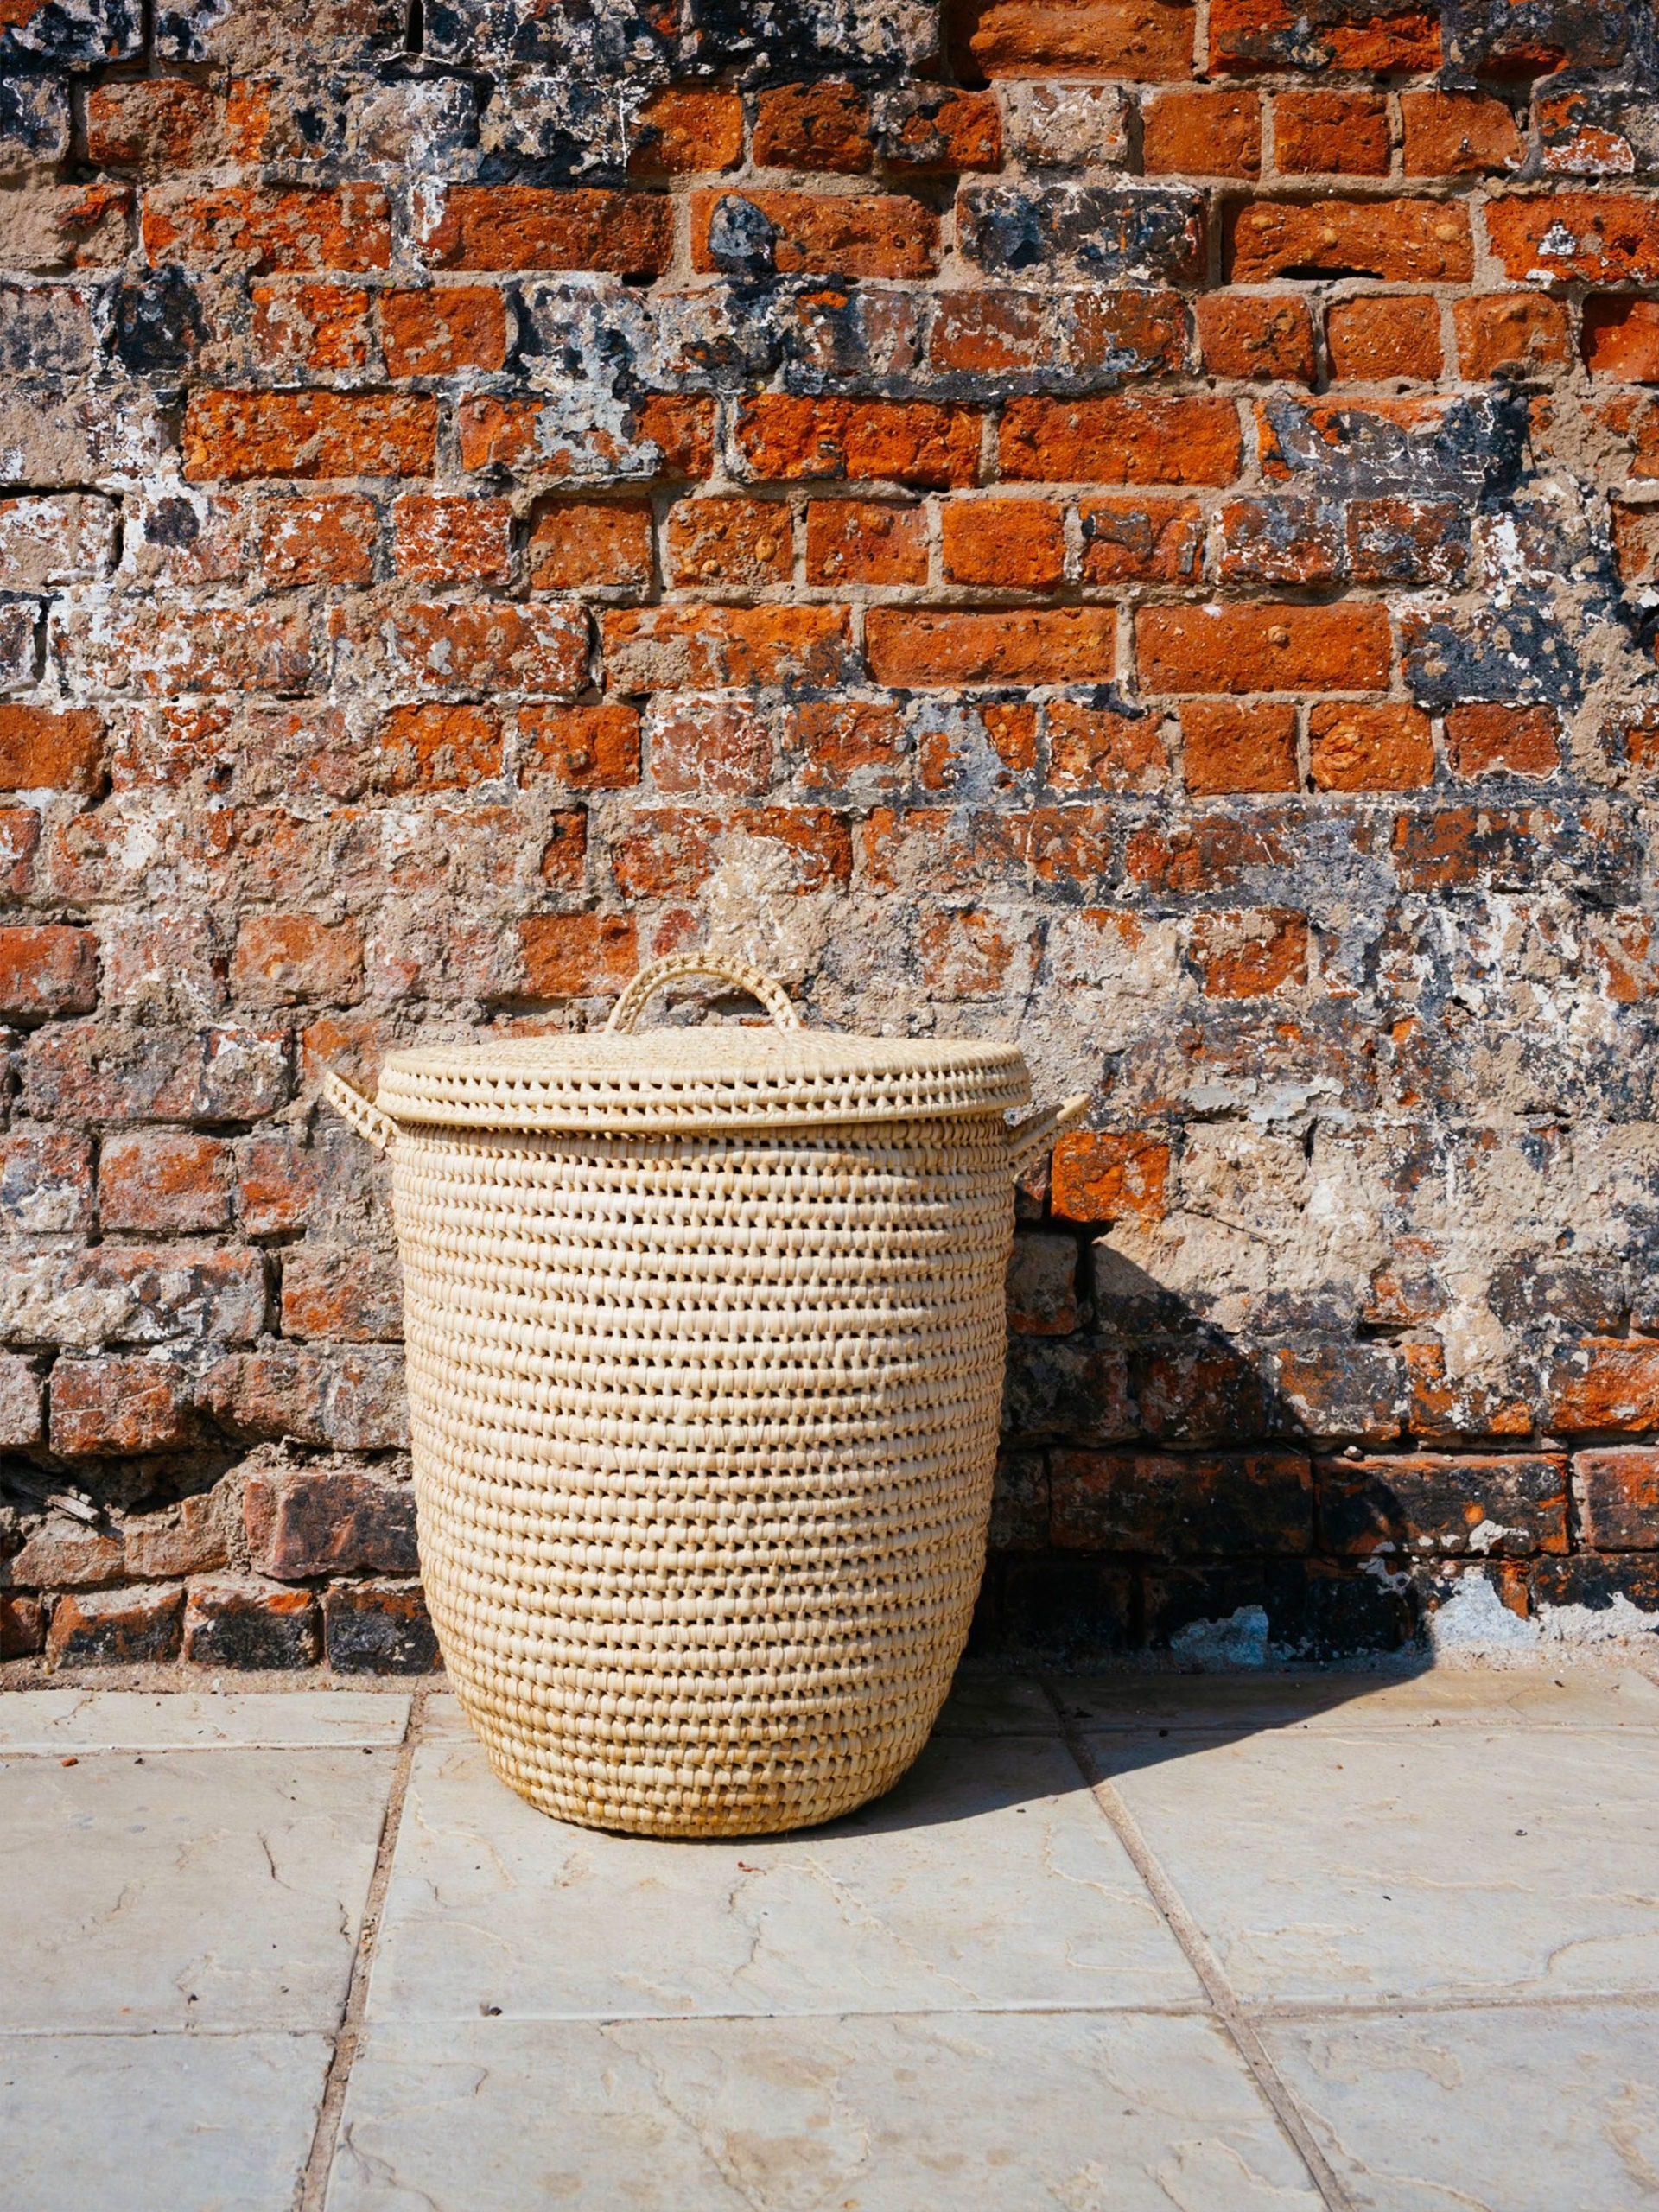 Zulu woven laundry basket